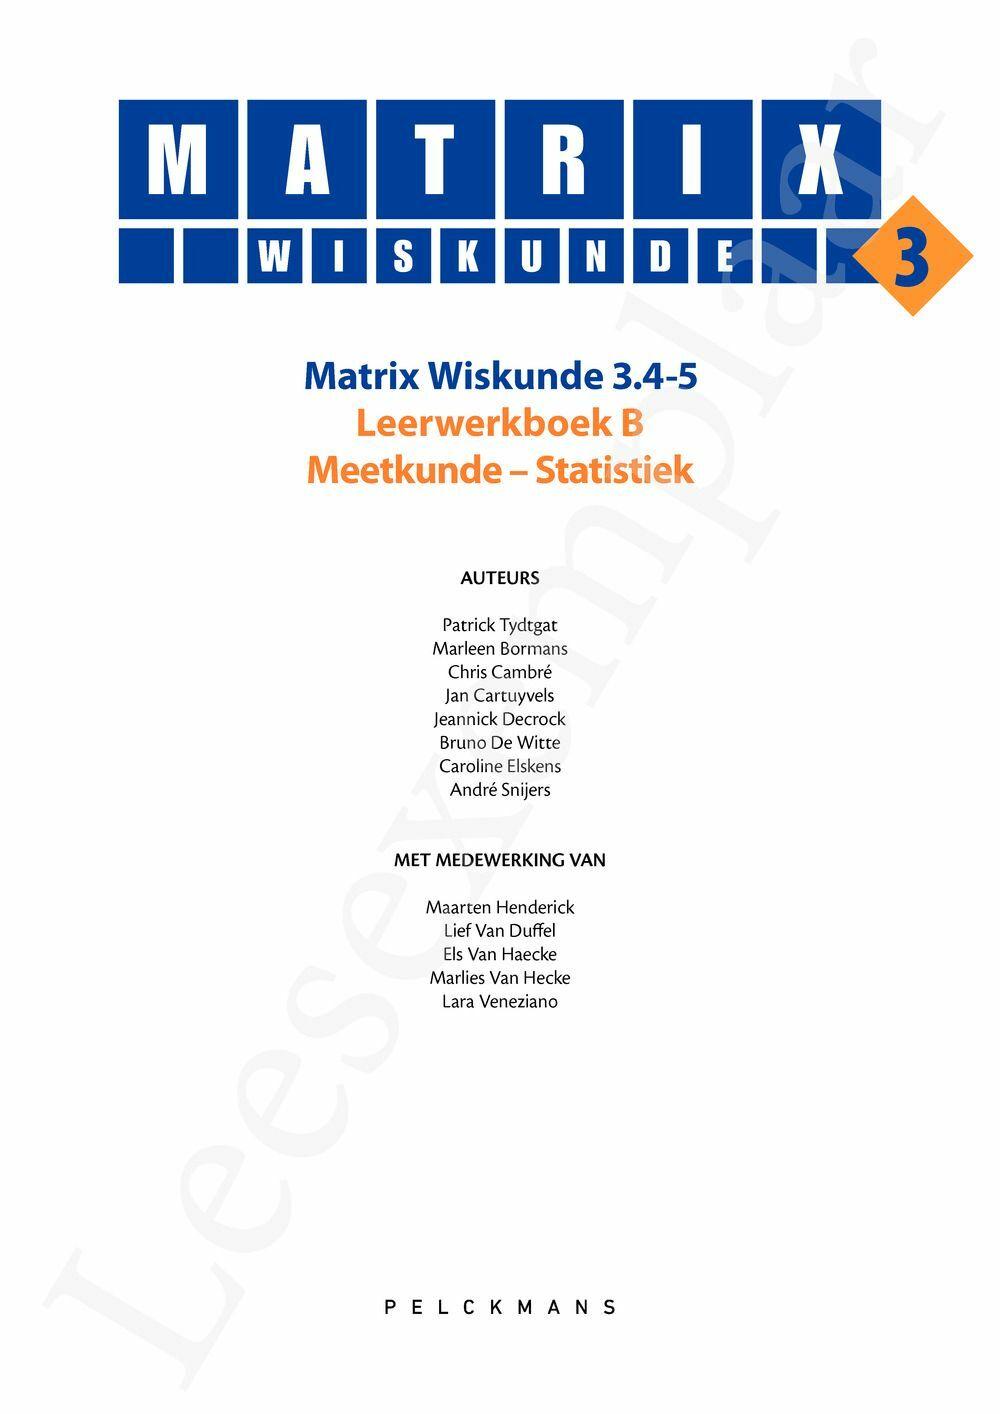 Preview: Matrix Wiskunde 3.4-5 Leerwerkboek B Meetkunde - Statistiek (inclusief Pelckmans Portaal)